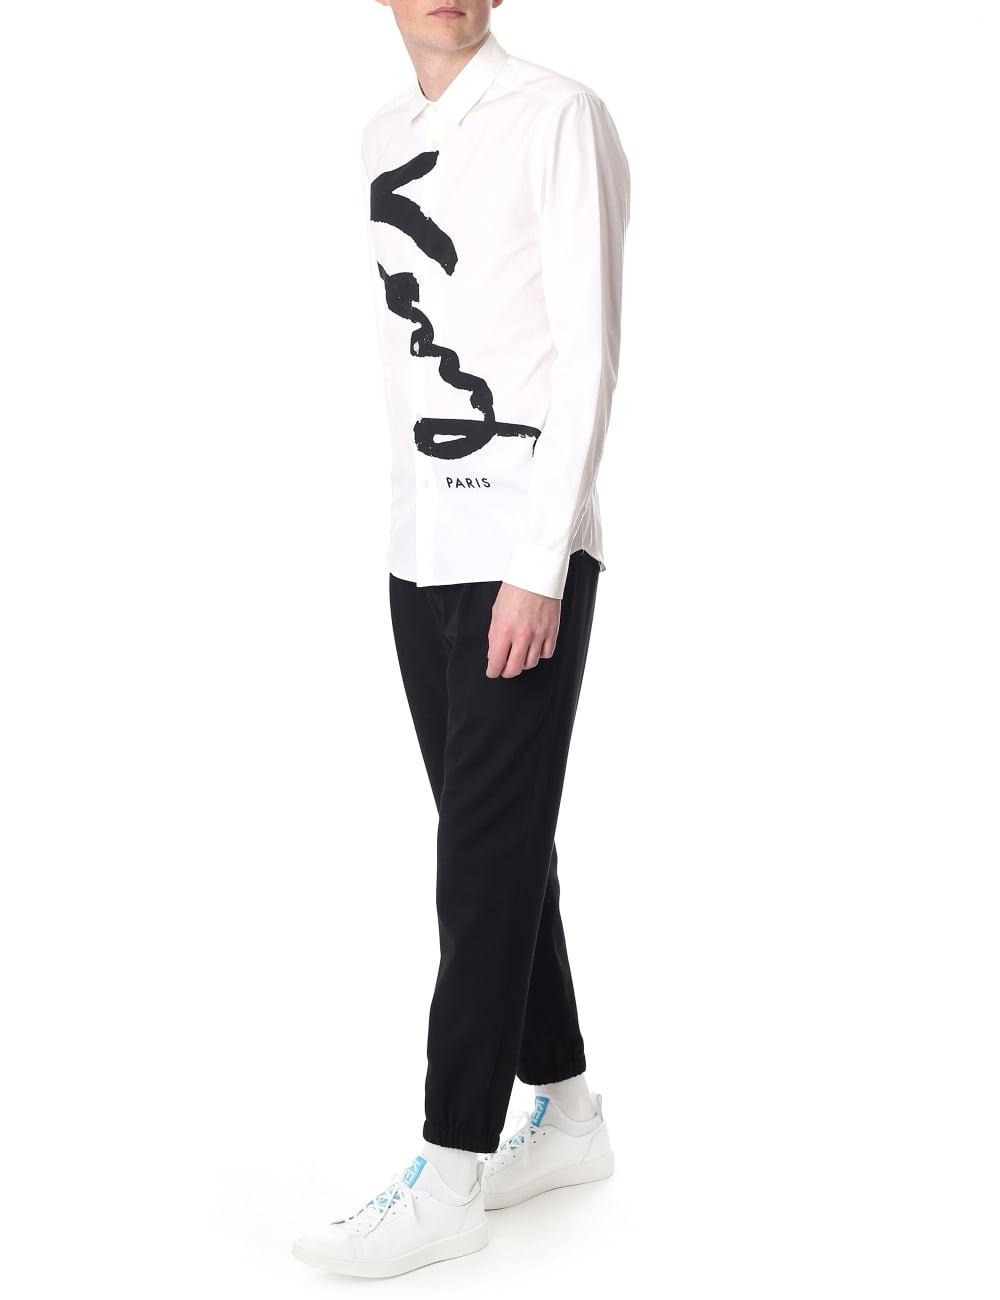 a5ae9159df Kenzo Signature Slim Fit Men's Shirt